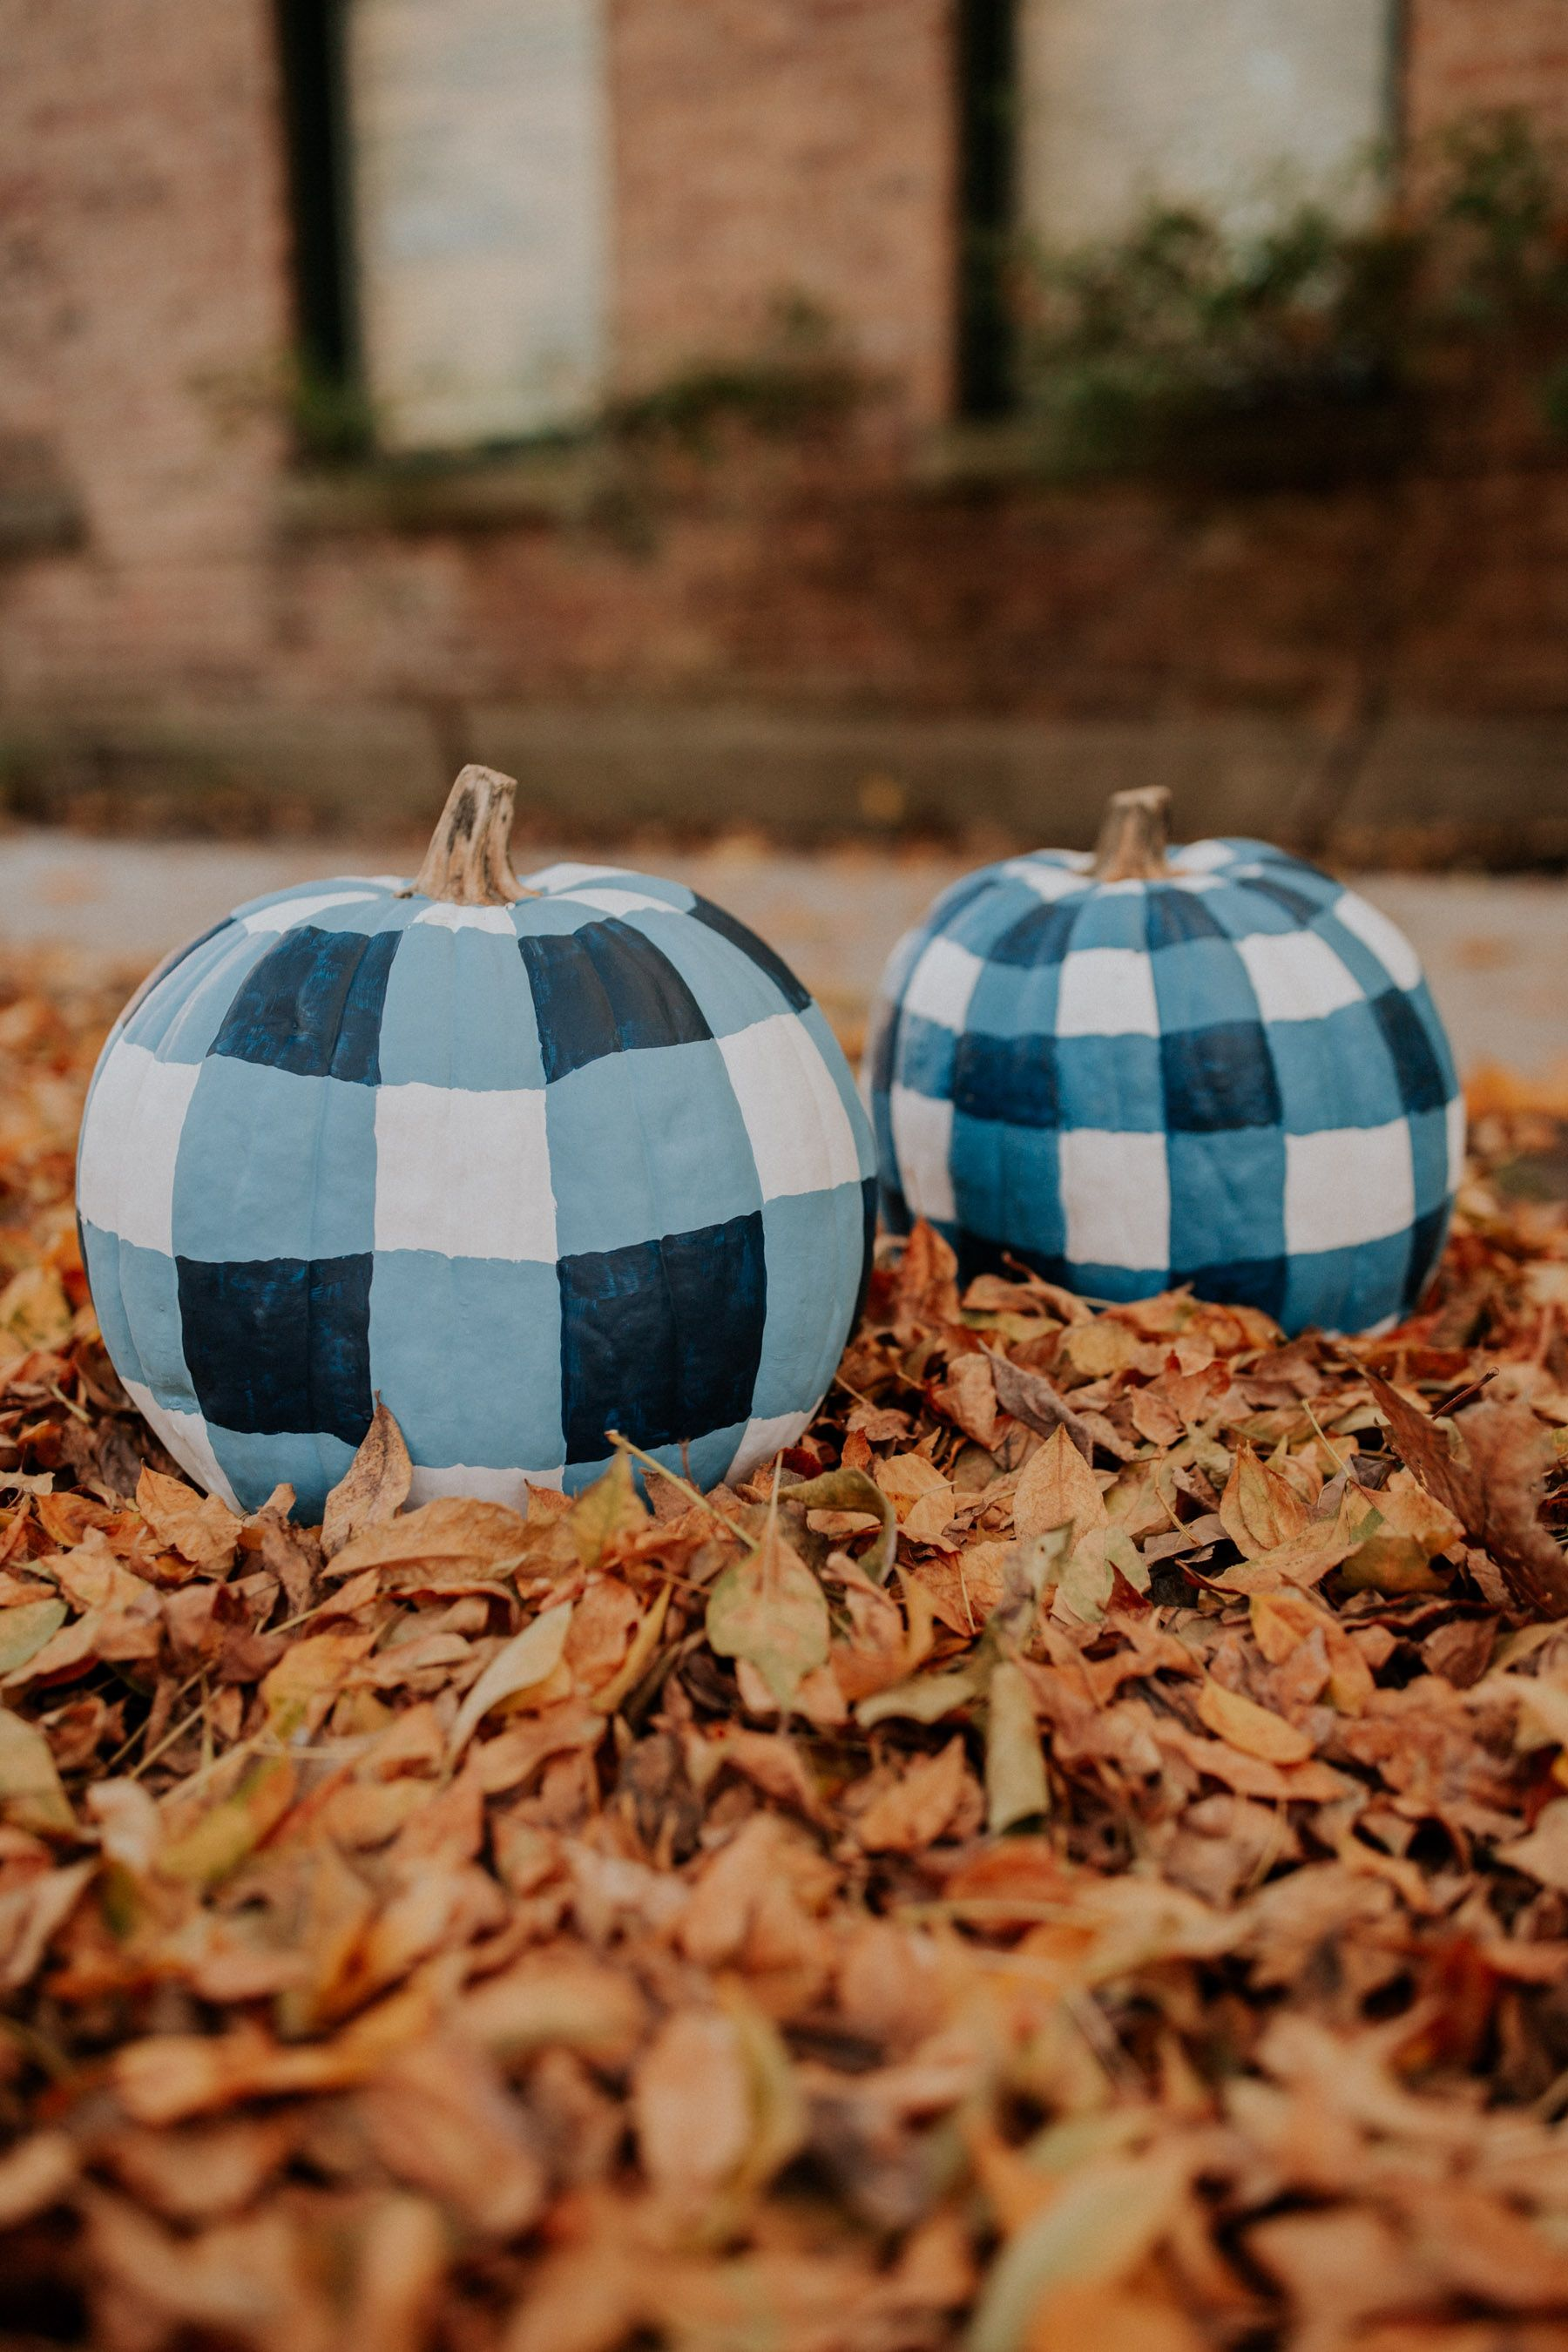 Diy Gingham Pumpkins Tutorial How To Paint Gingham Pumpkins